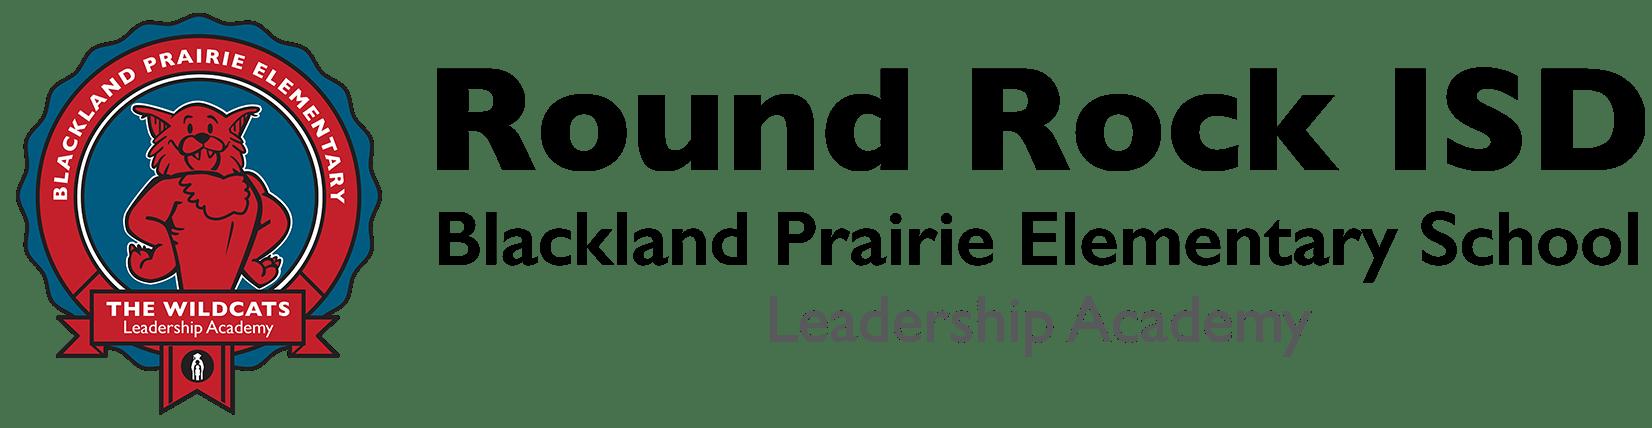 Blackland Prairie Elementary School